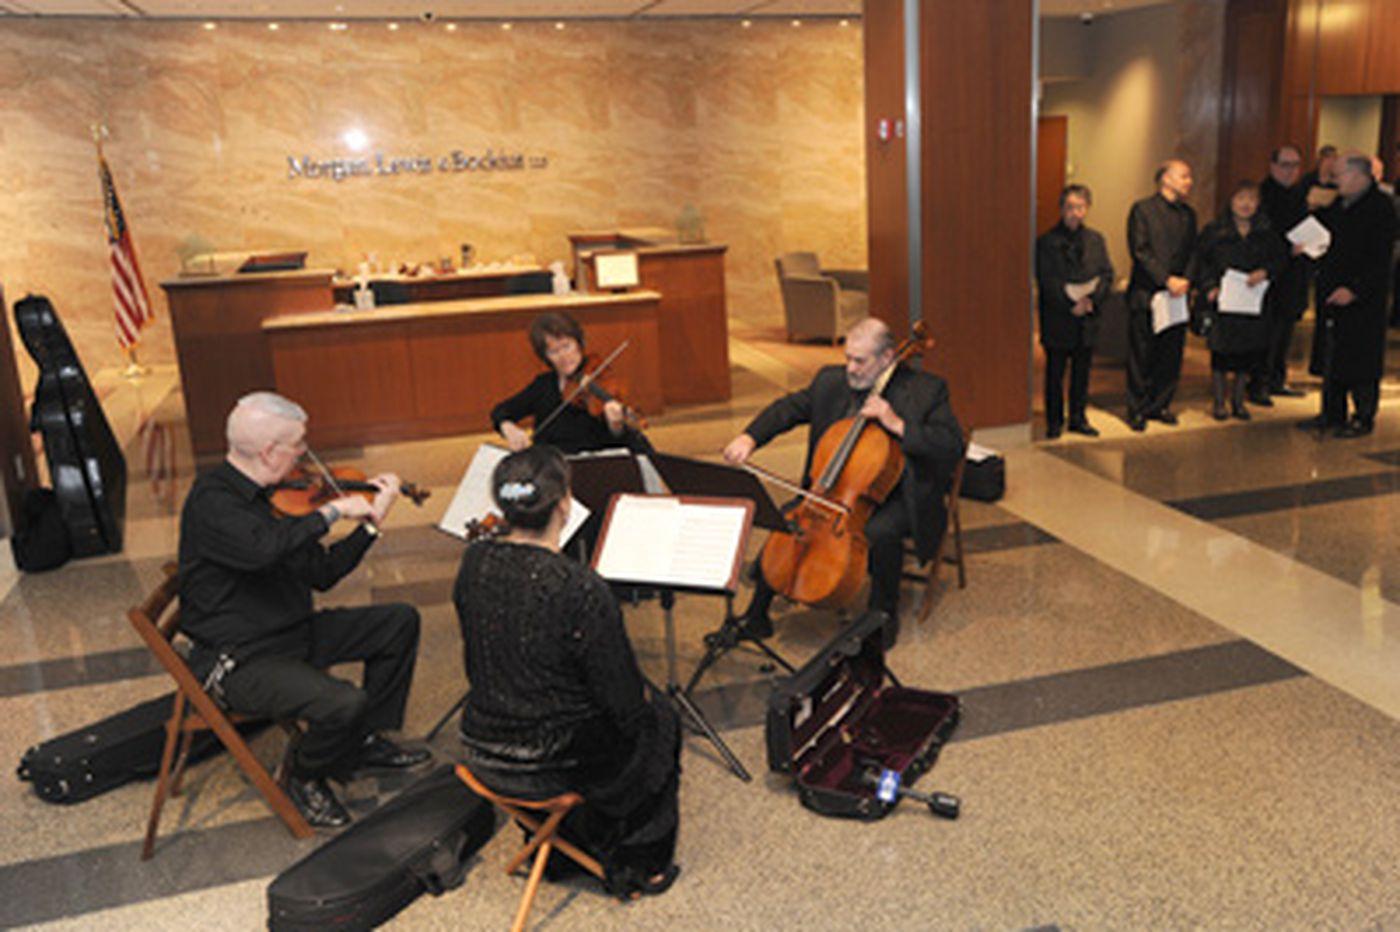 Philadelphia Orchestra seeks bankruptcy reorganization